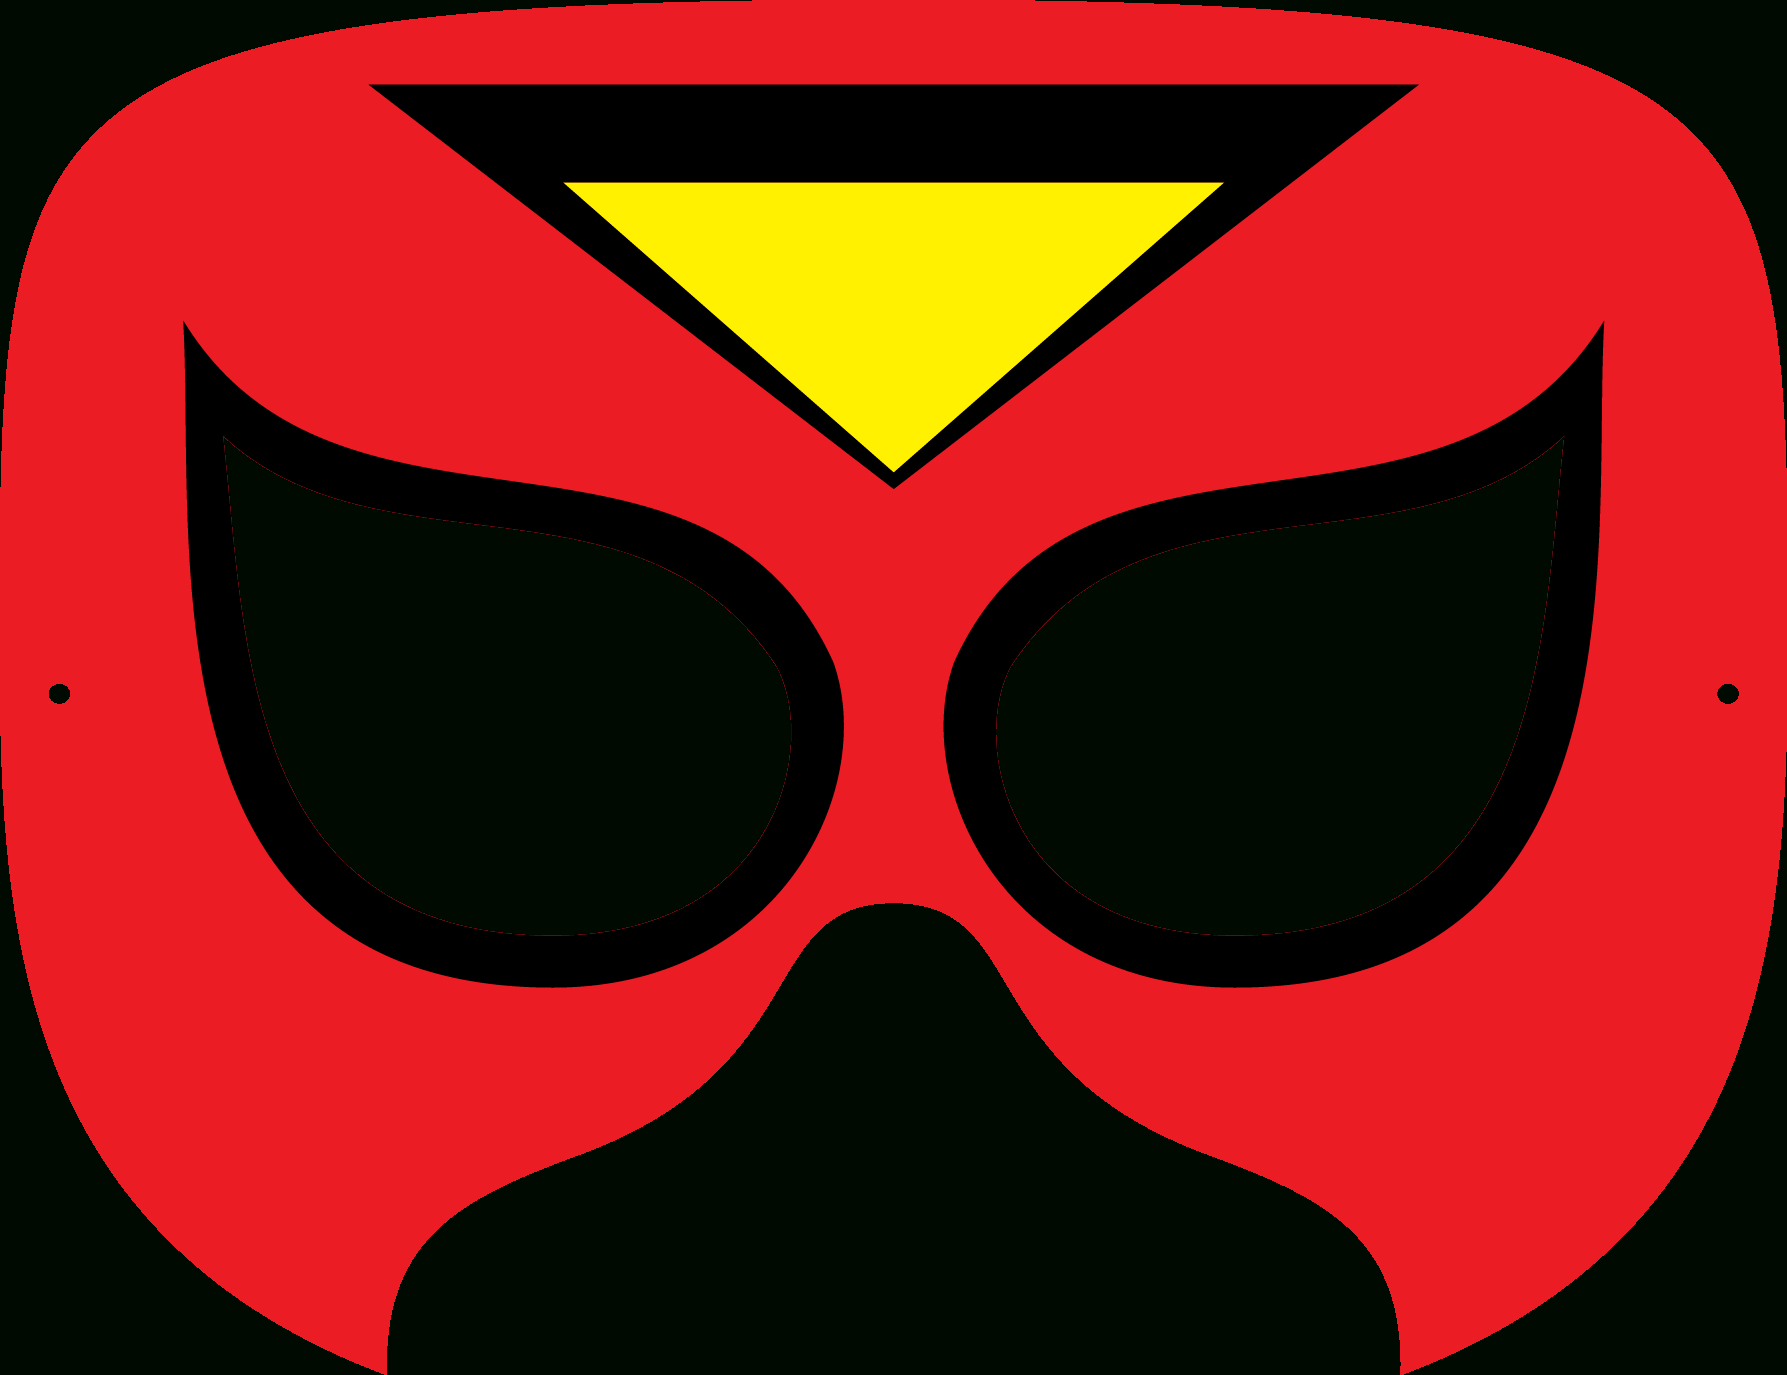 Superhero Mask Template   Free Download Best Superhero Mask Template - Free Printable Superhero Masks